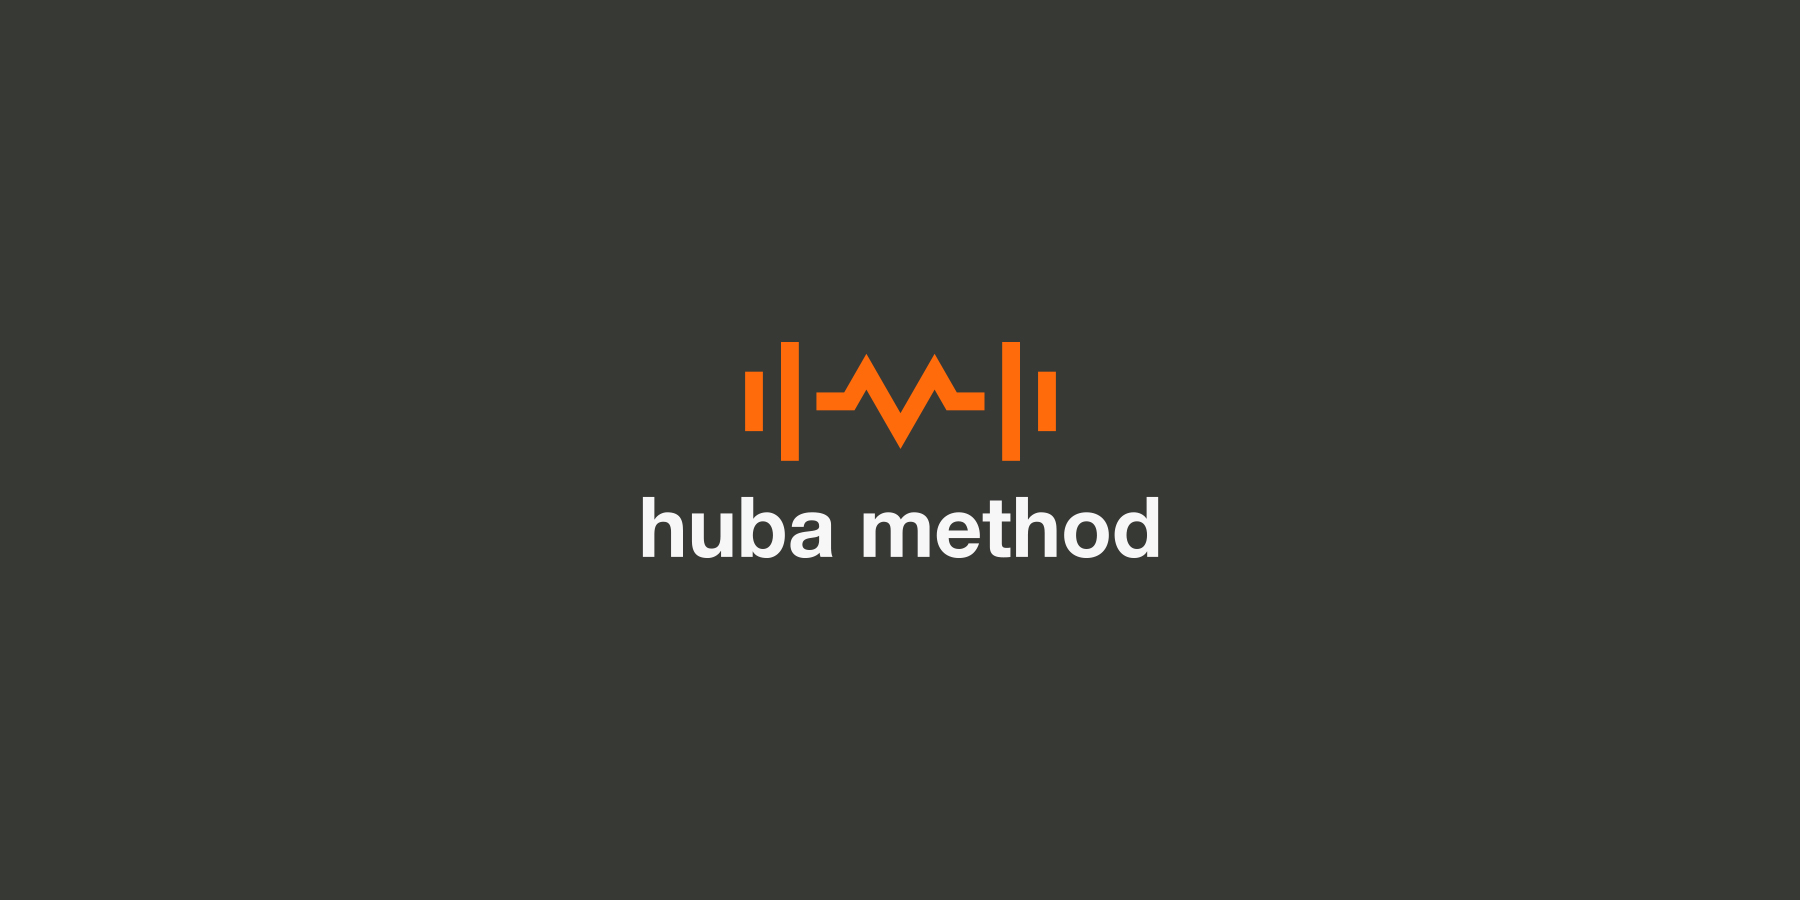 huba-method-logo-design-05